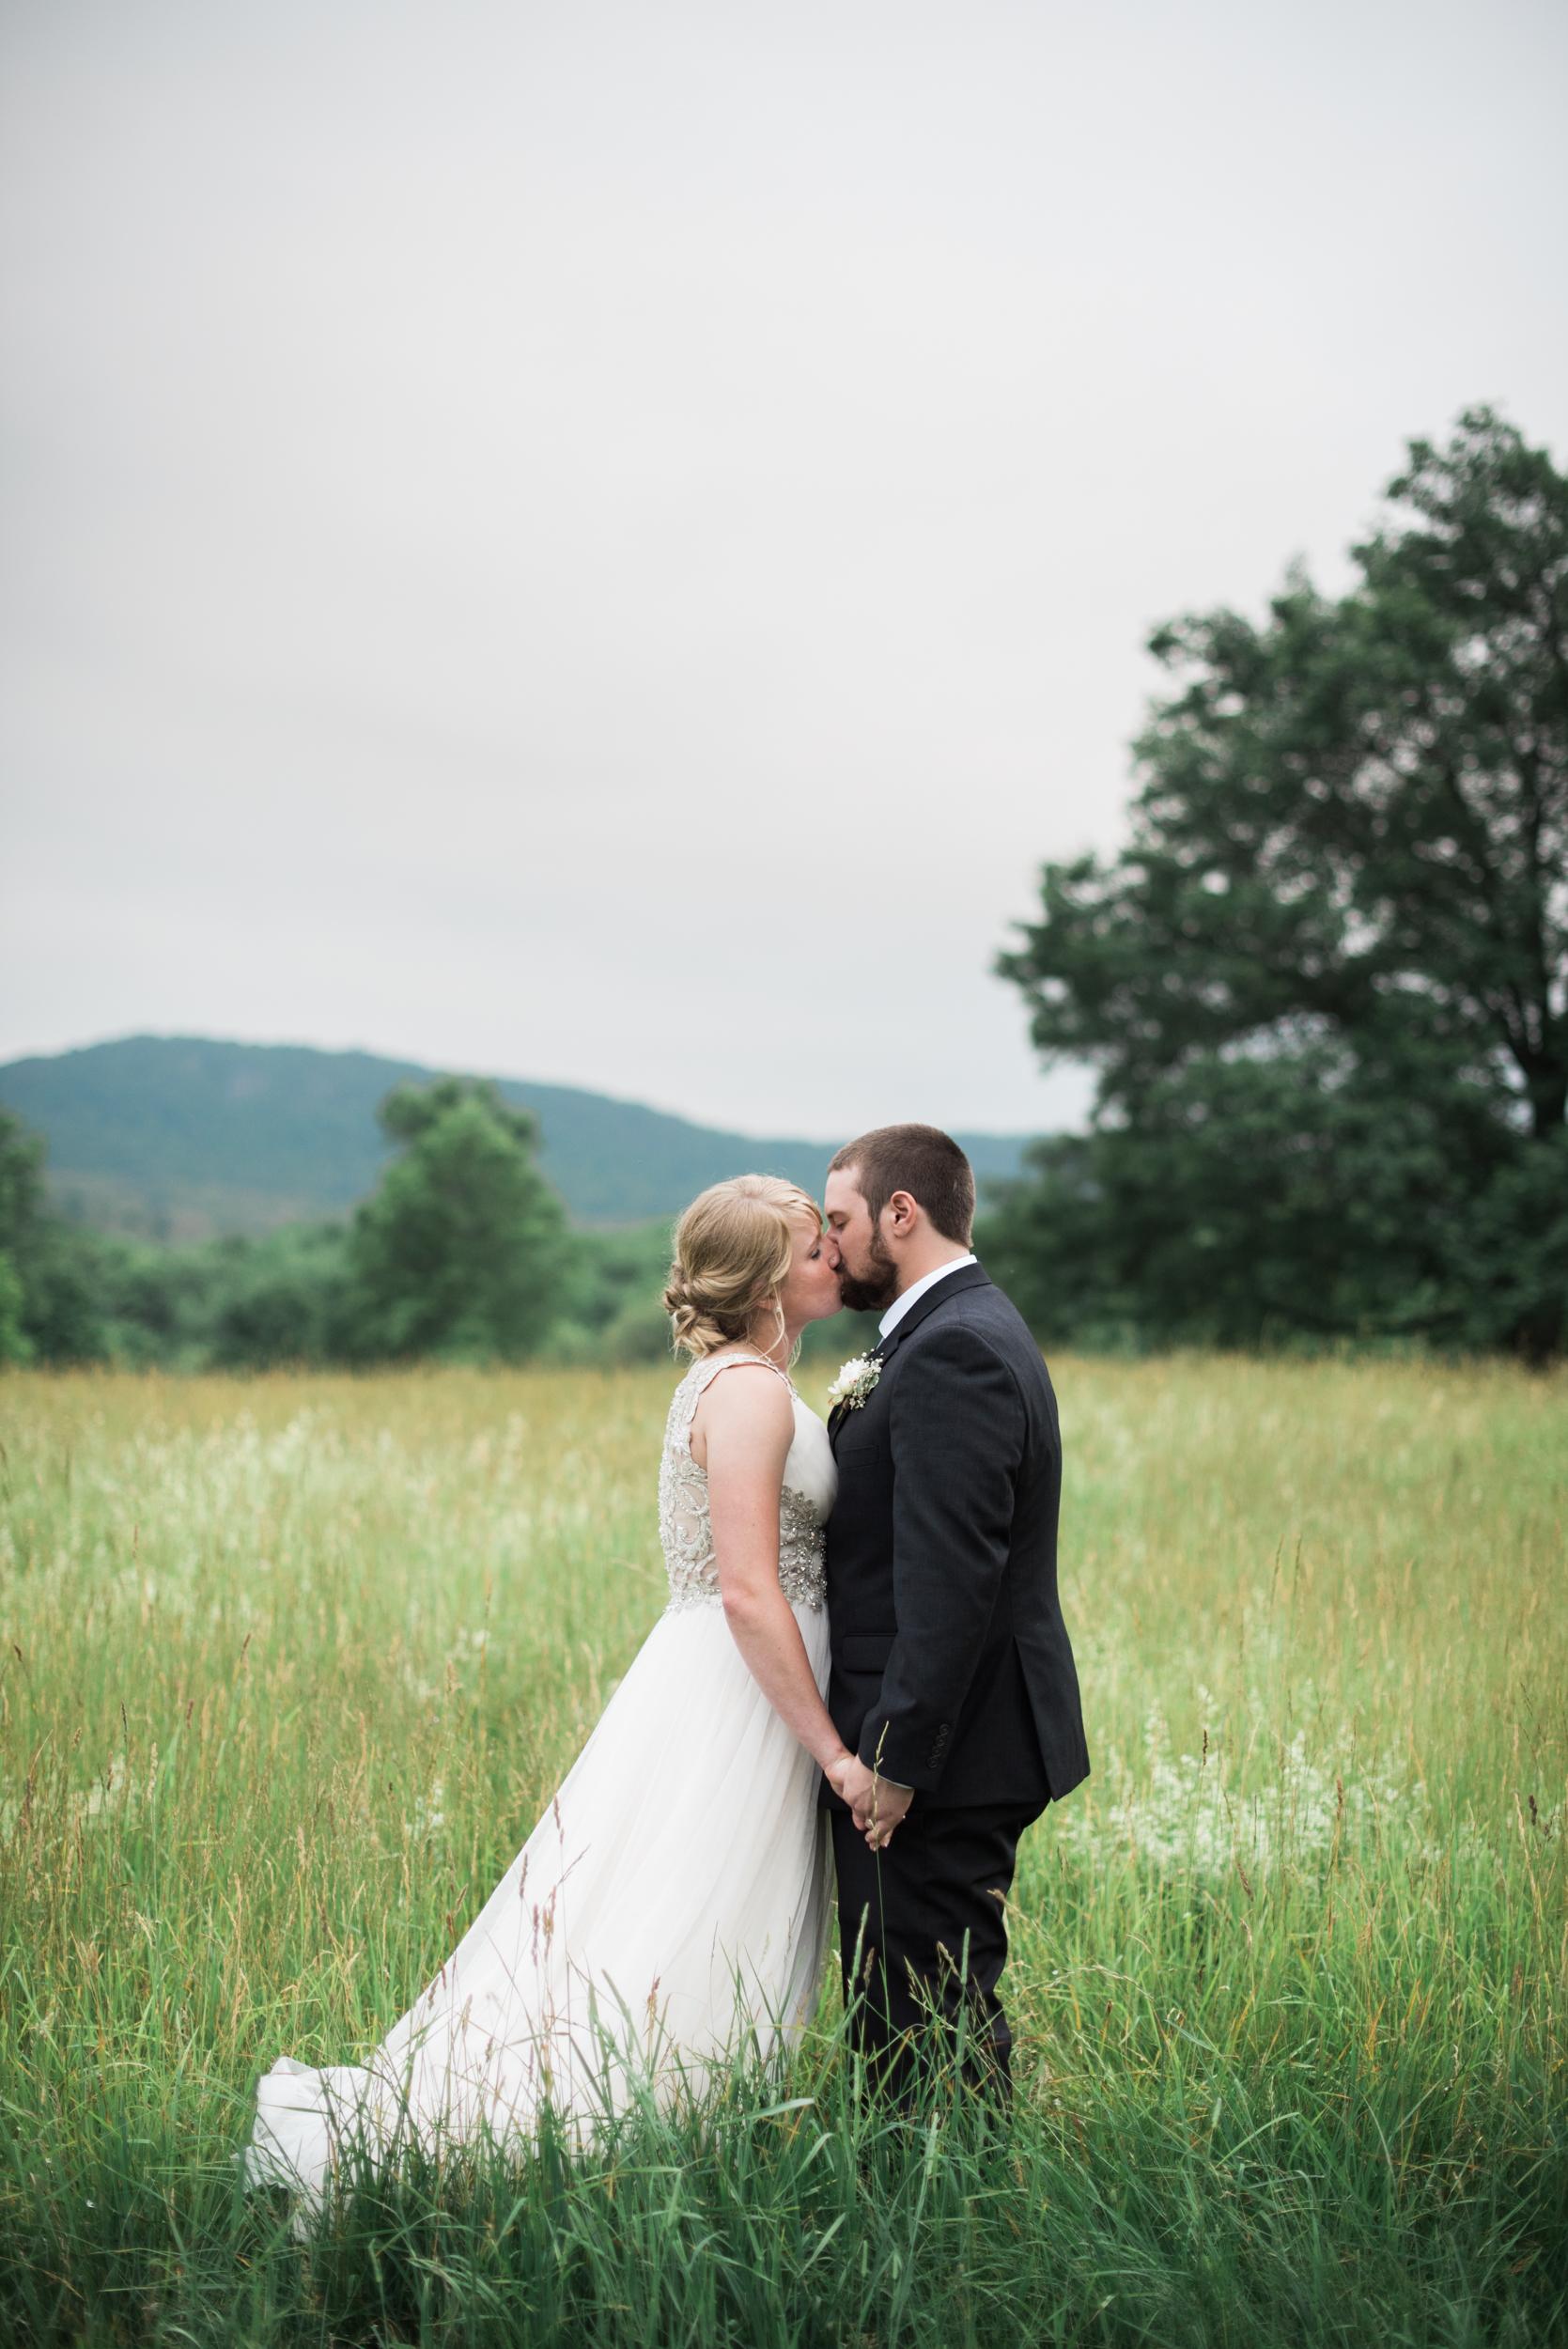 Rustic wedding in Amherst Ma